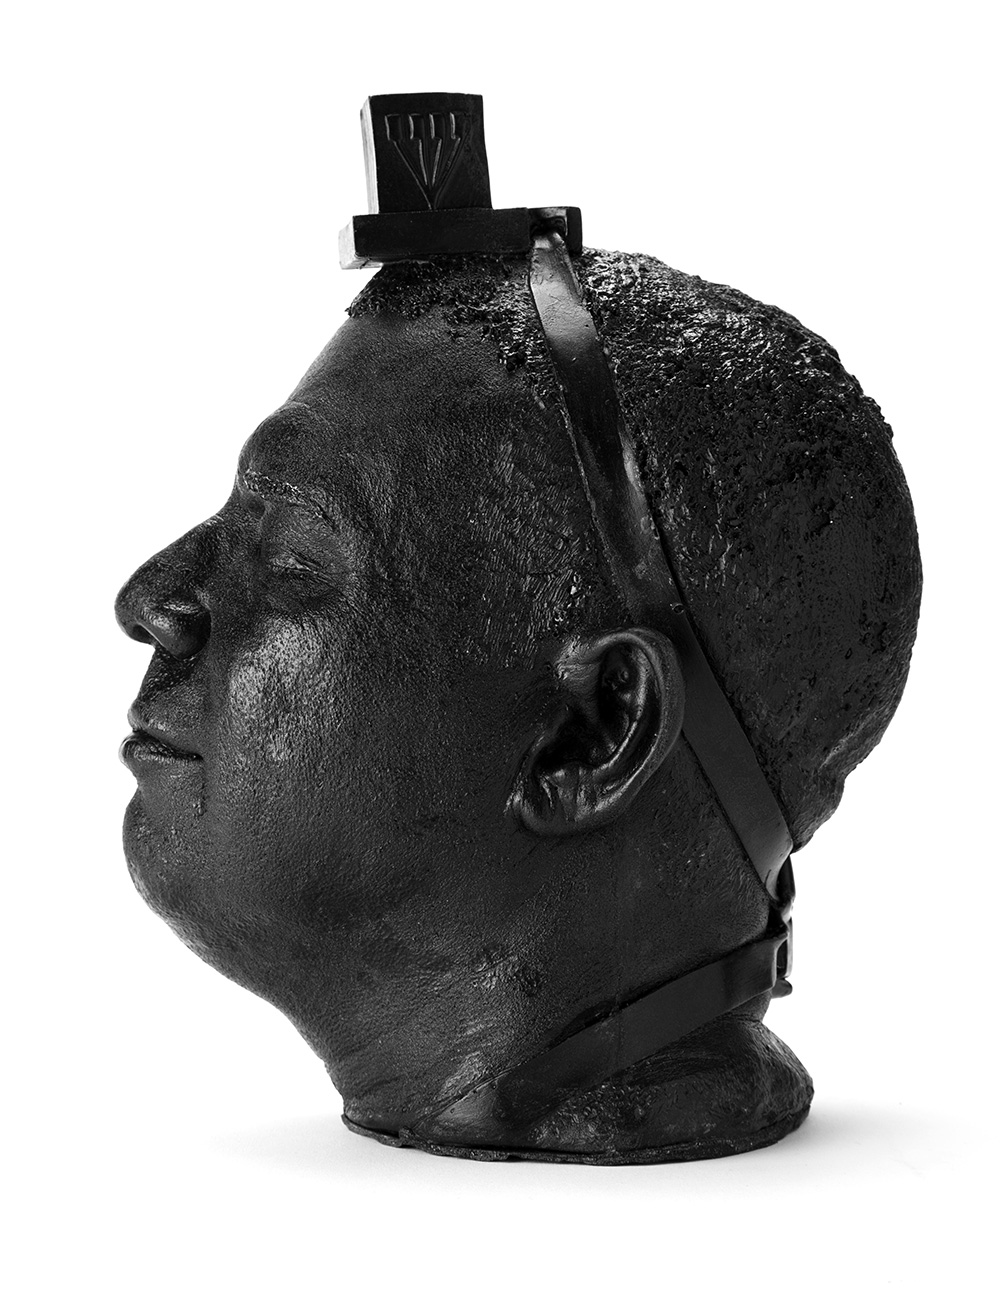 פסל הראש של וייס עם תפילין